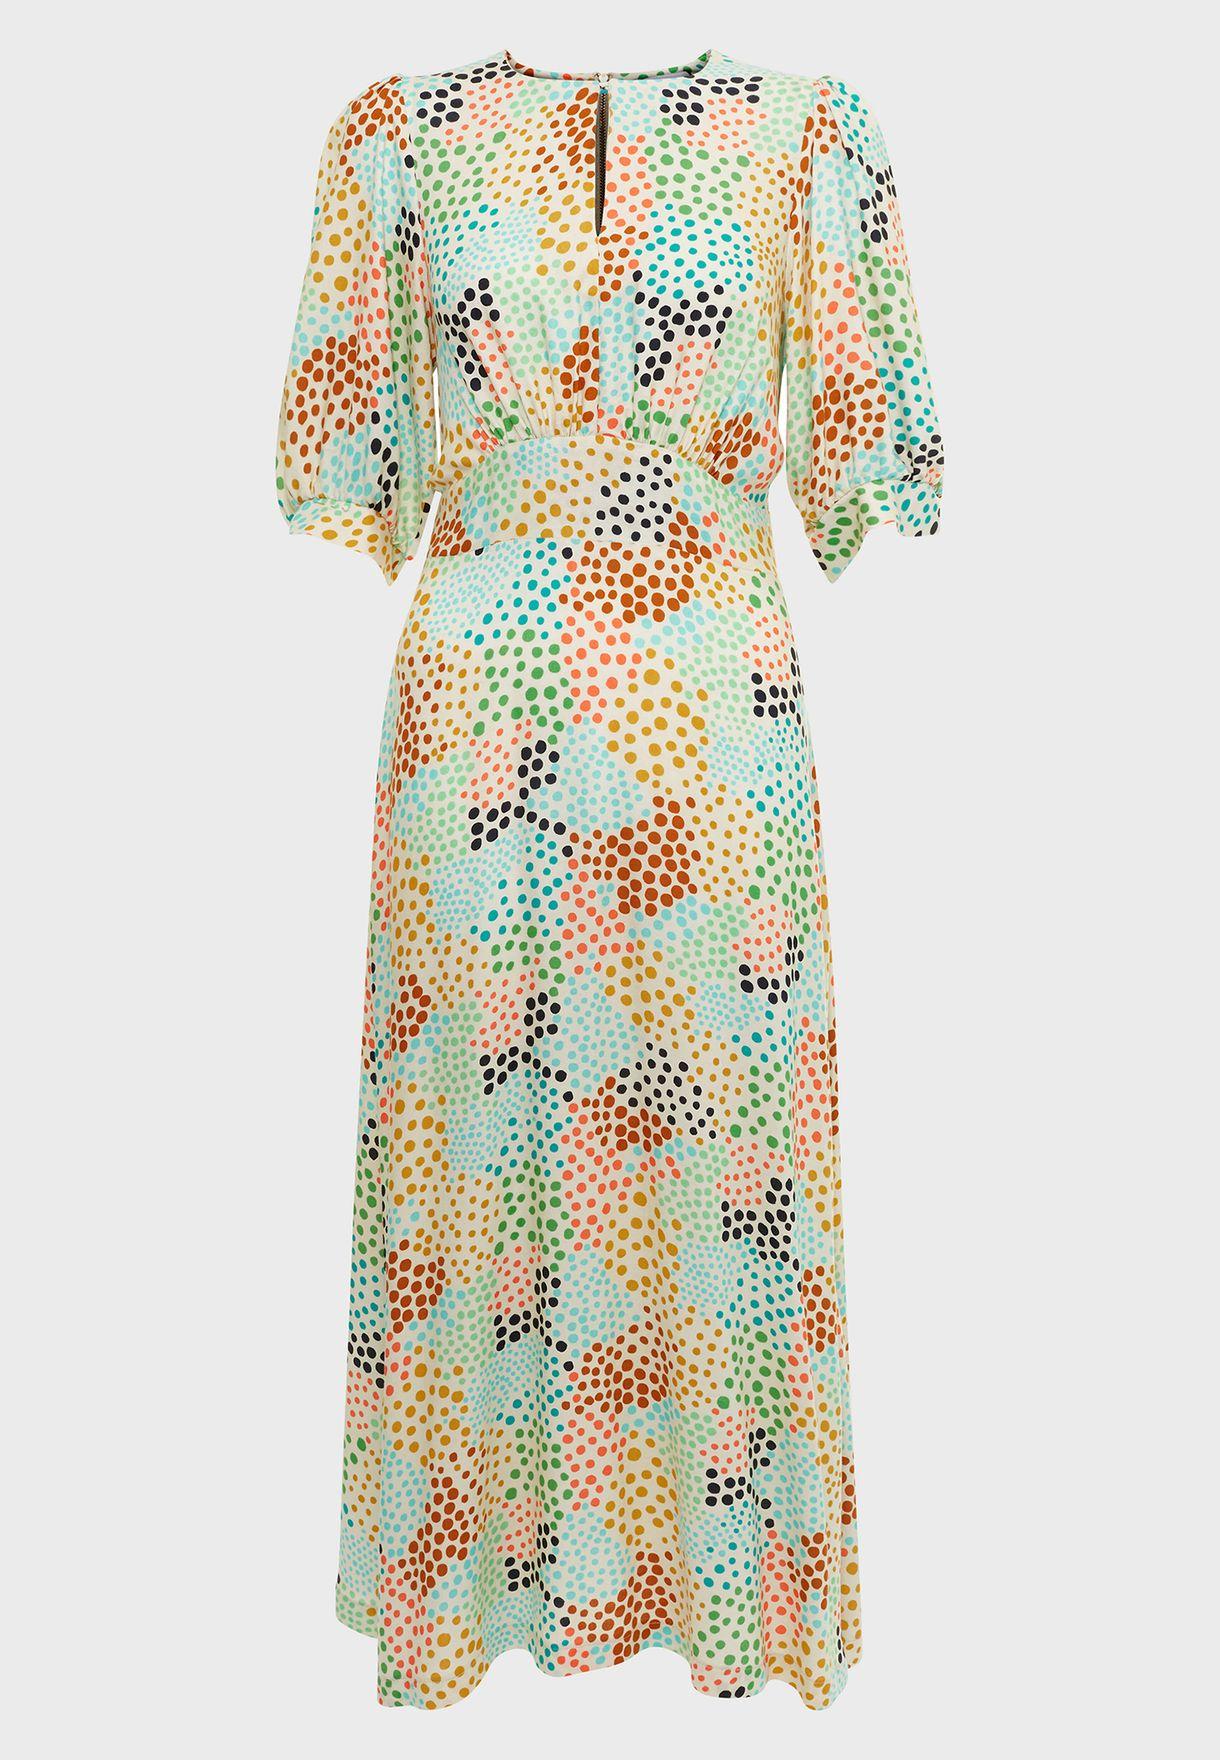 Puff Sleeve Pocket Dress